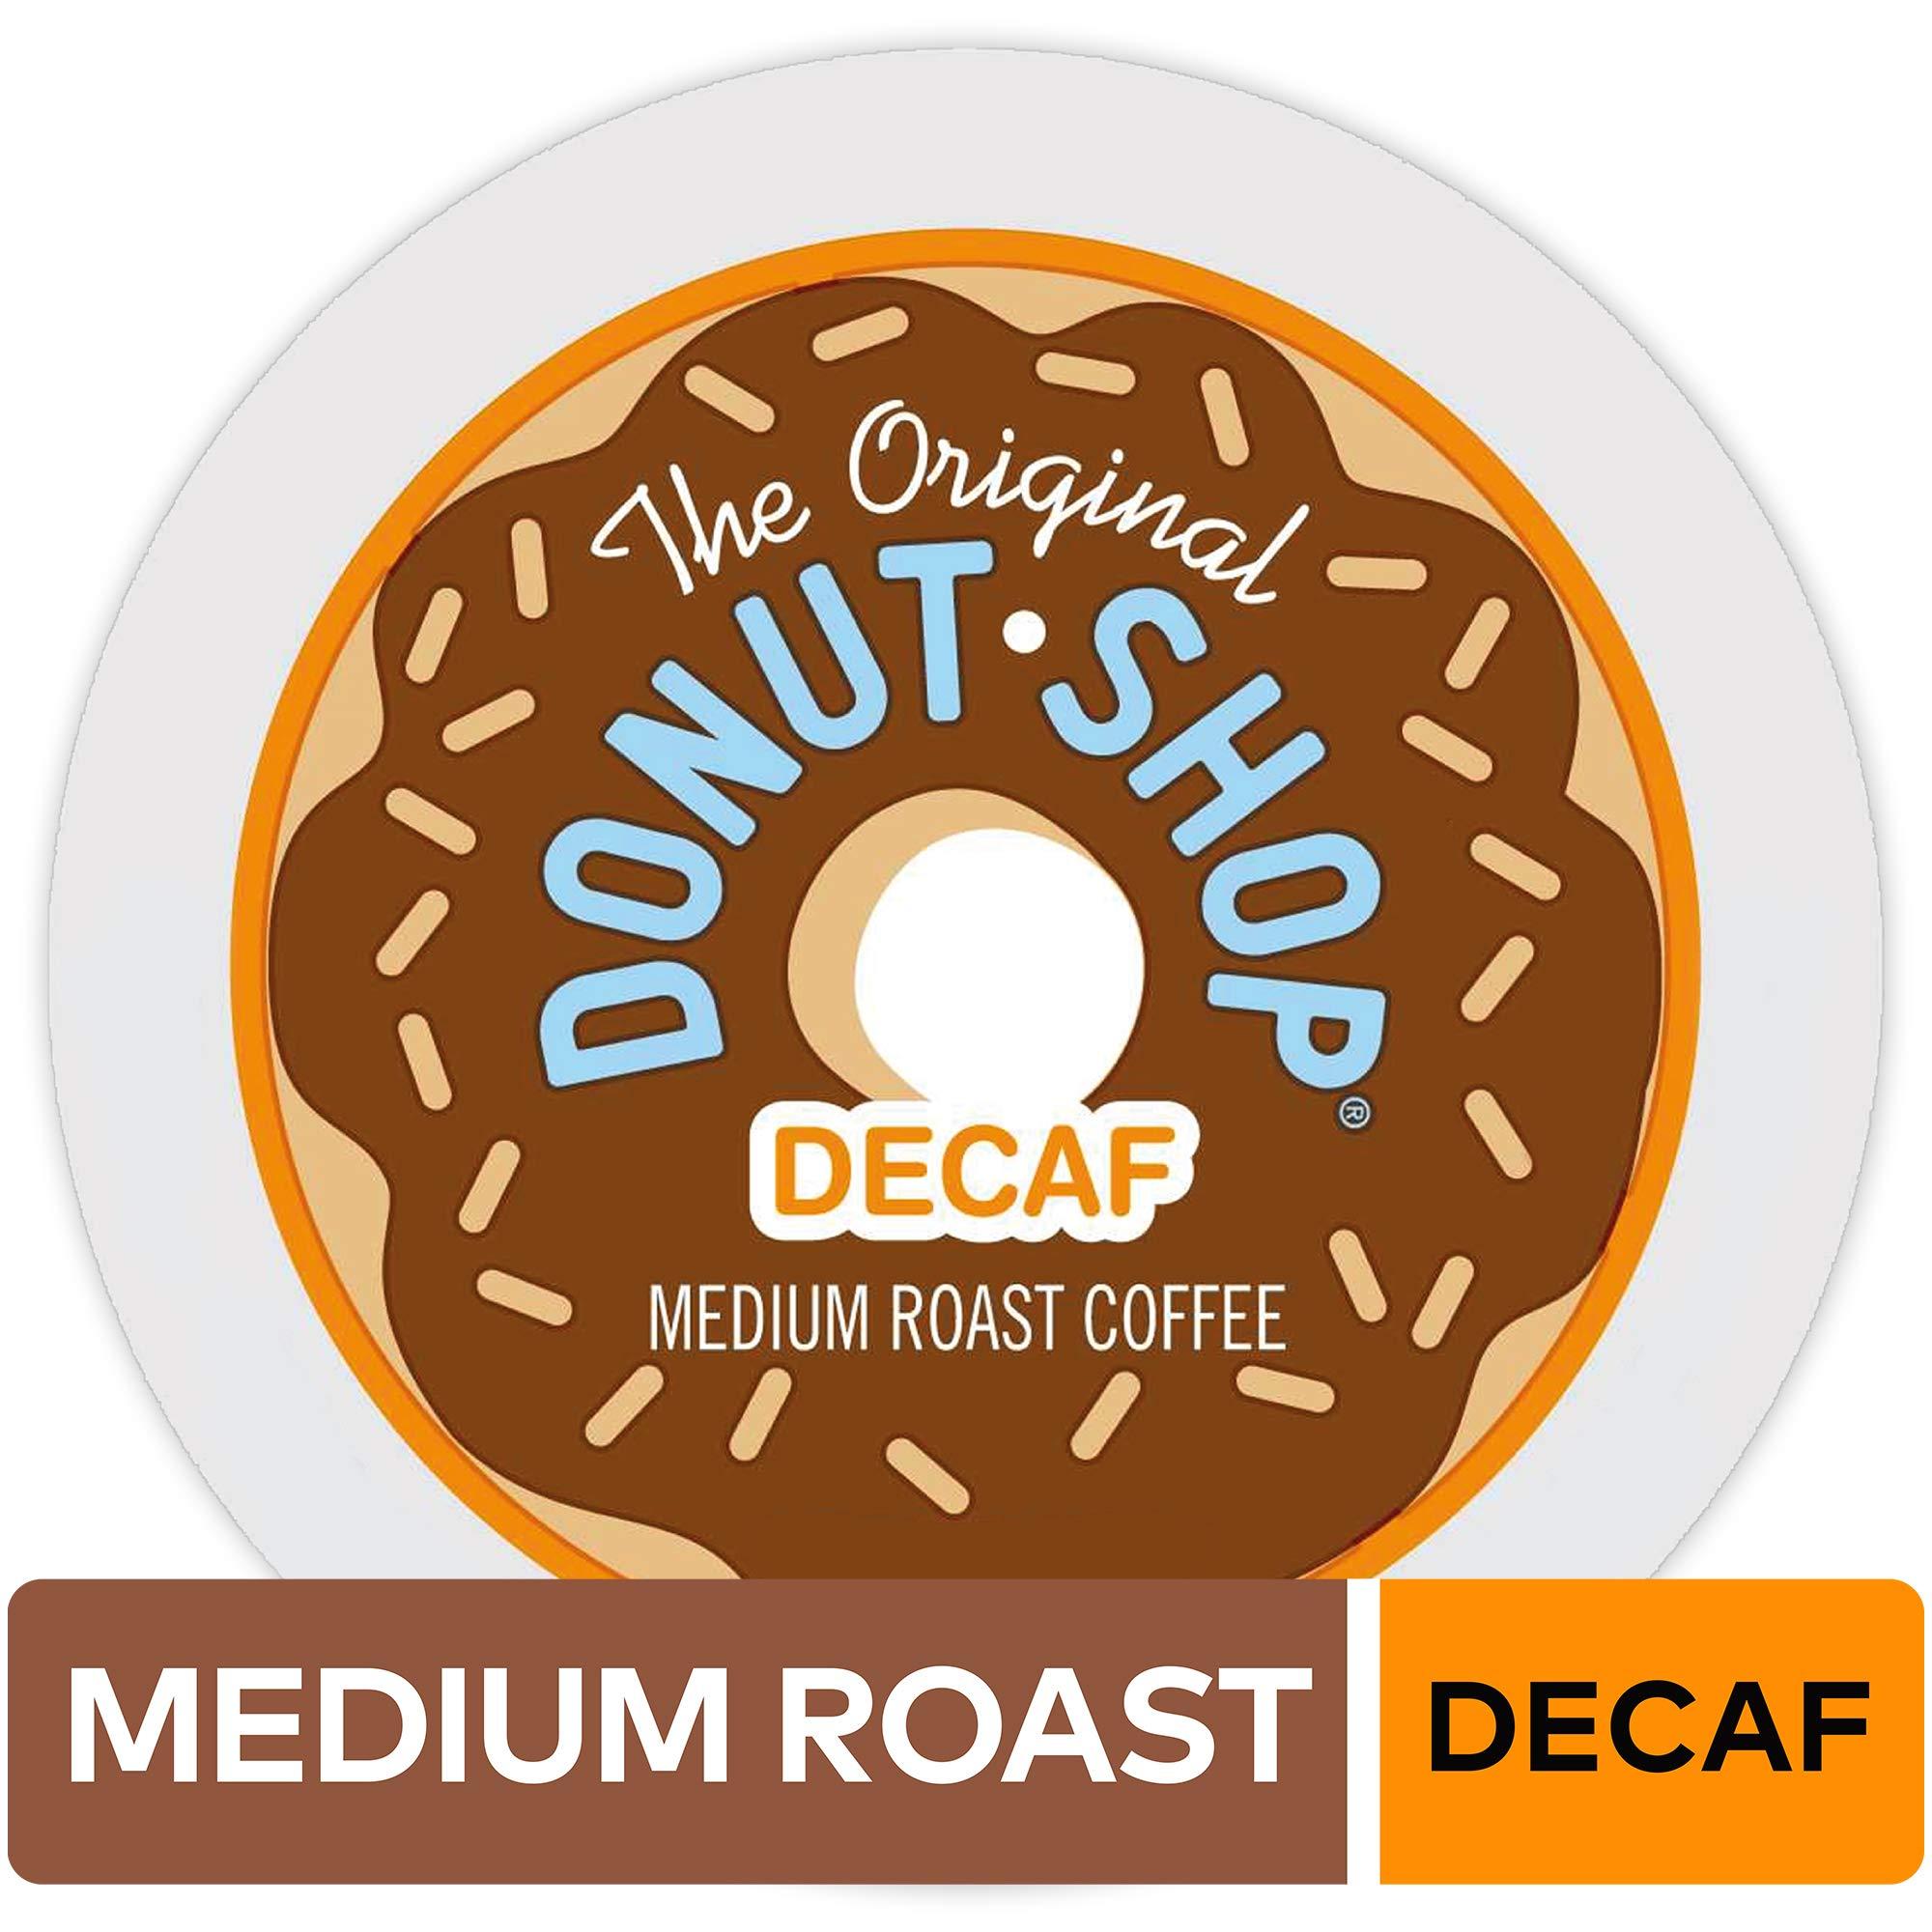 The Original Donut Shop Keurig Single-Serve K-Cup Pods, Medium Roast Coffee 12 count, DECAF (Pack of 6), 72 Count